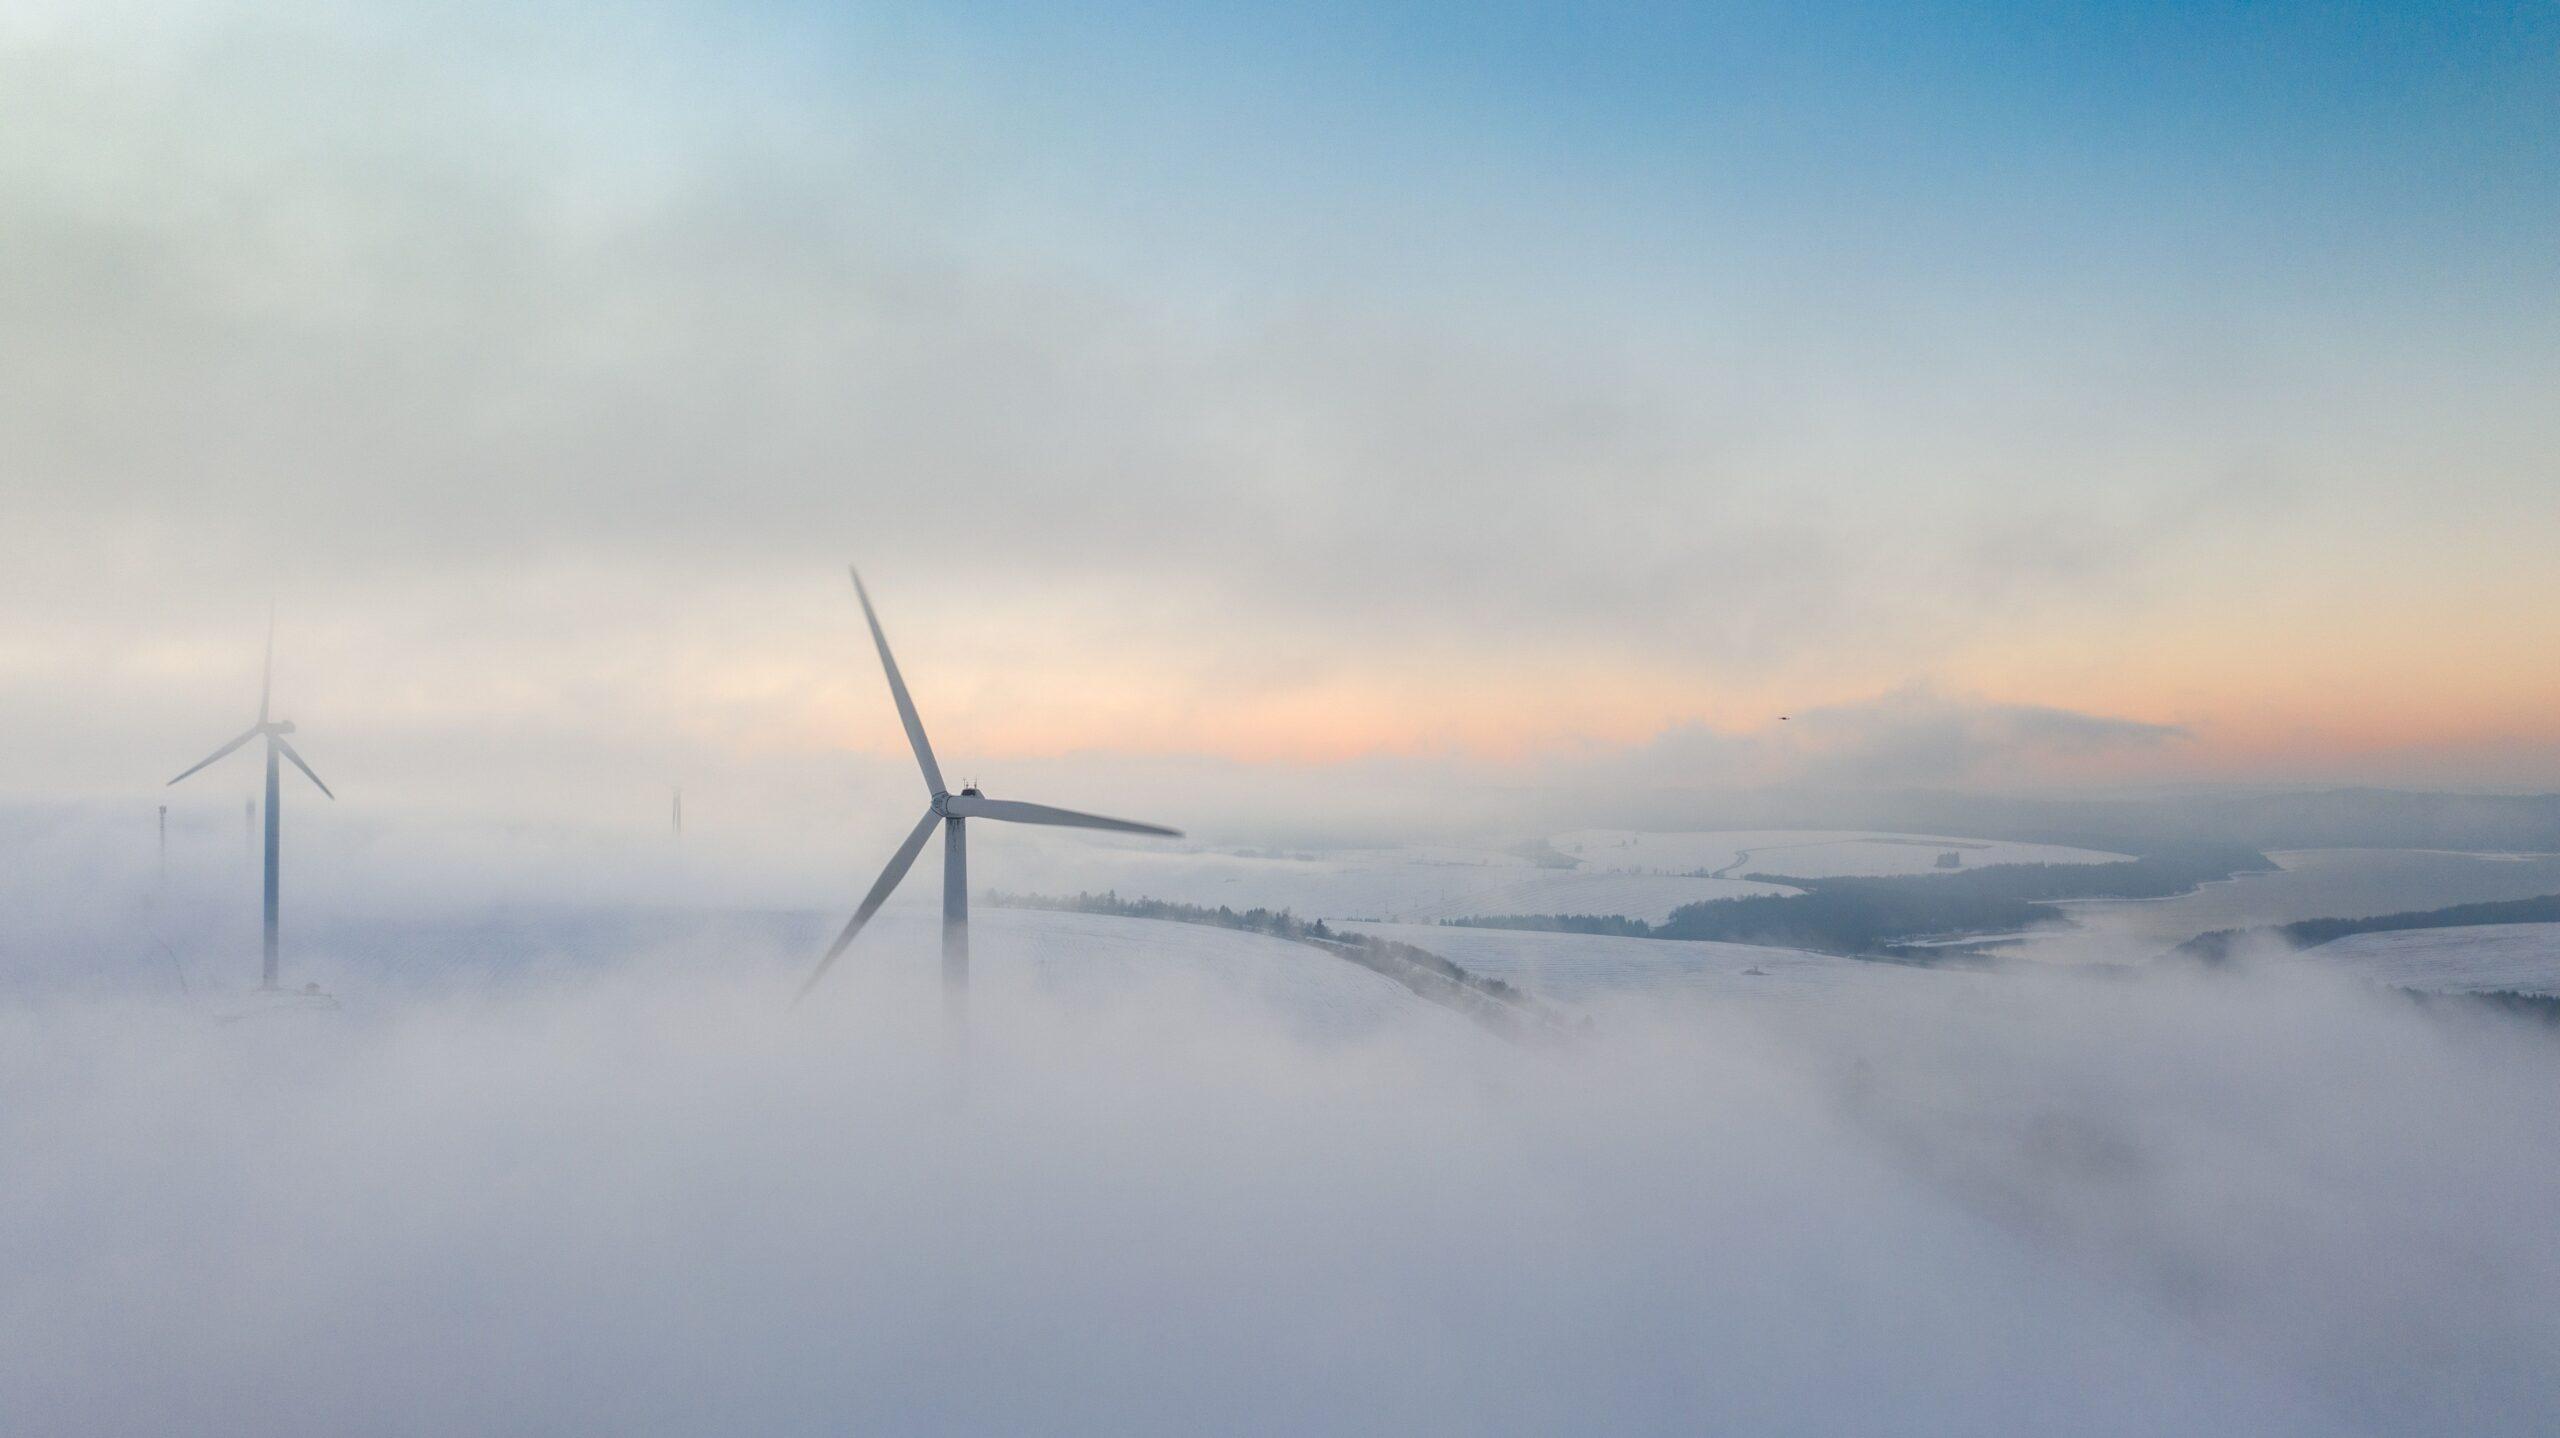 wind turbine inspection software